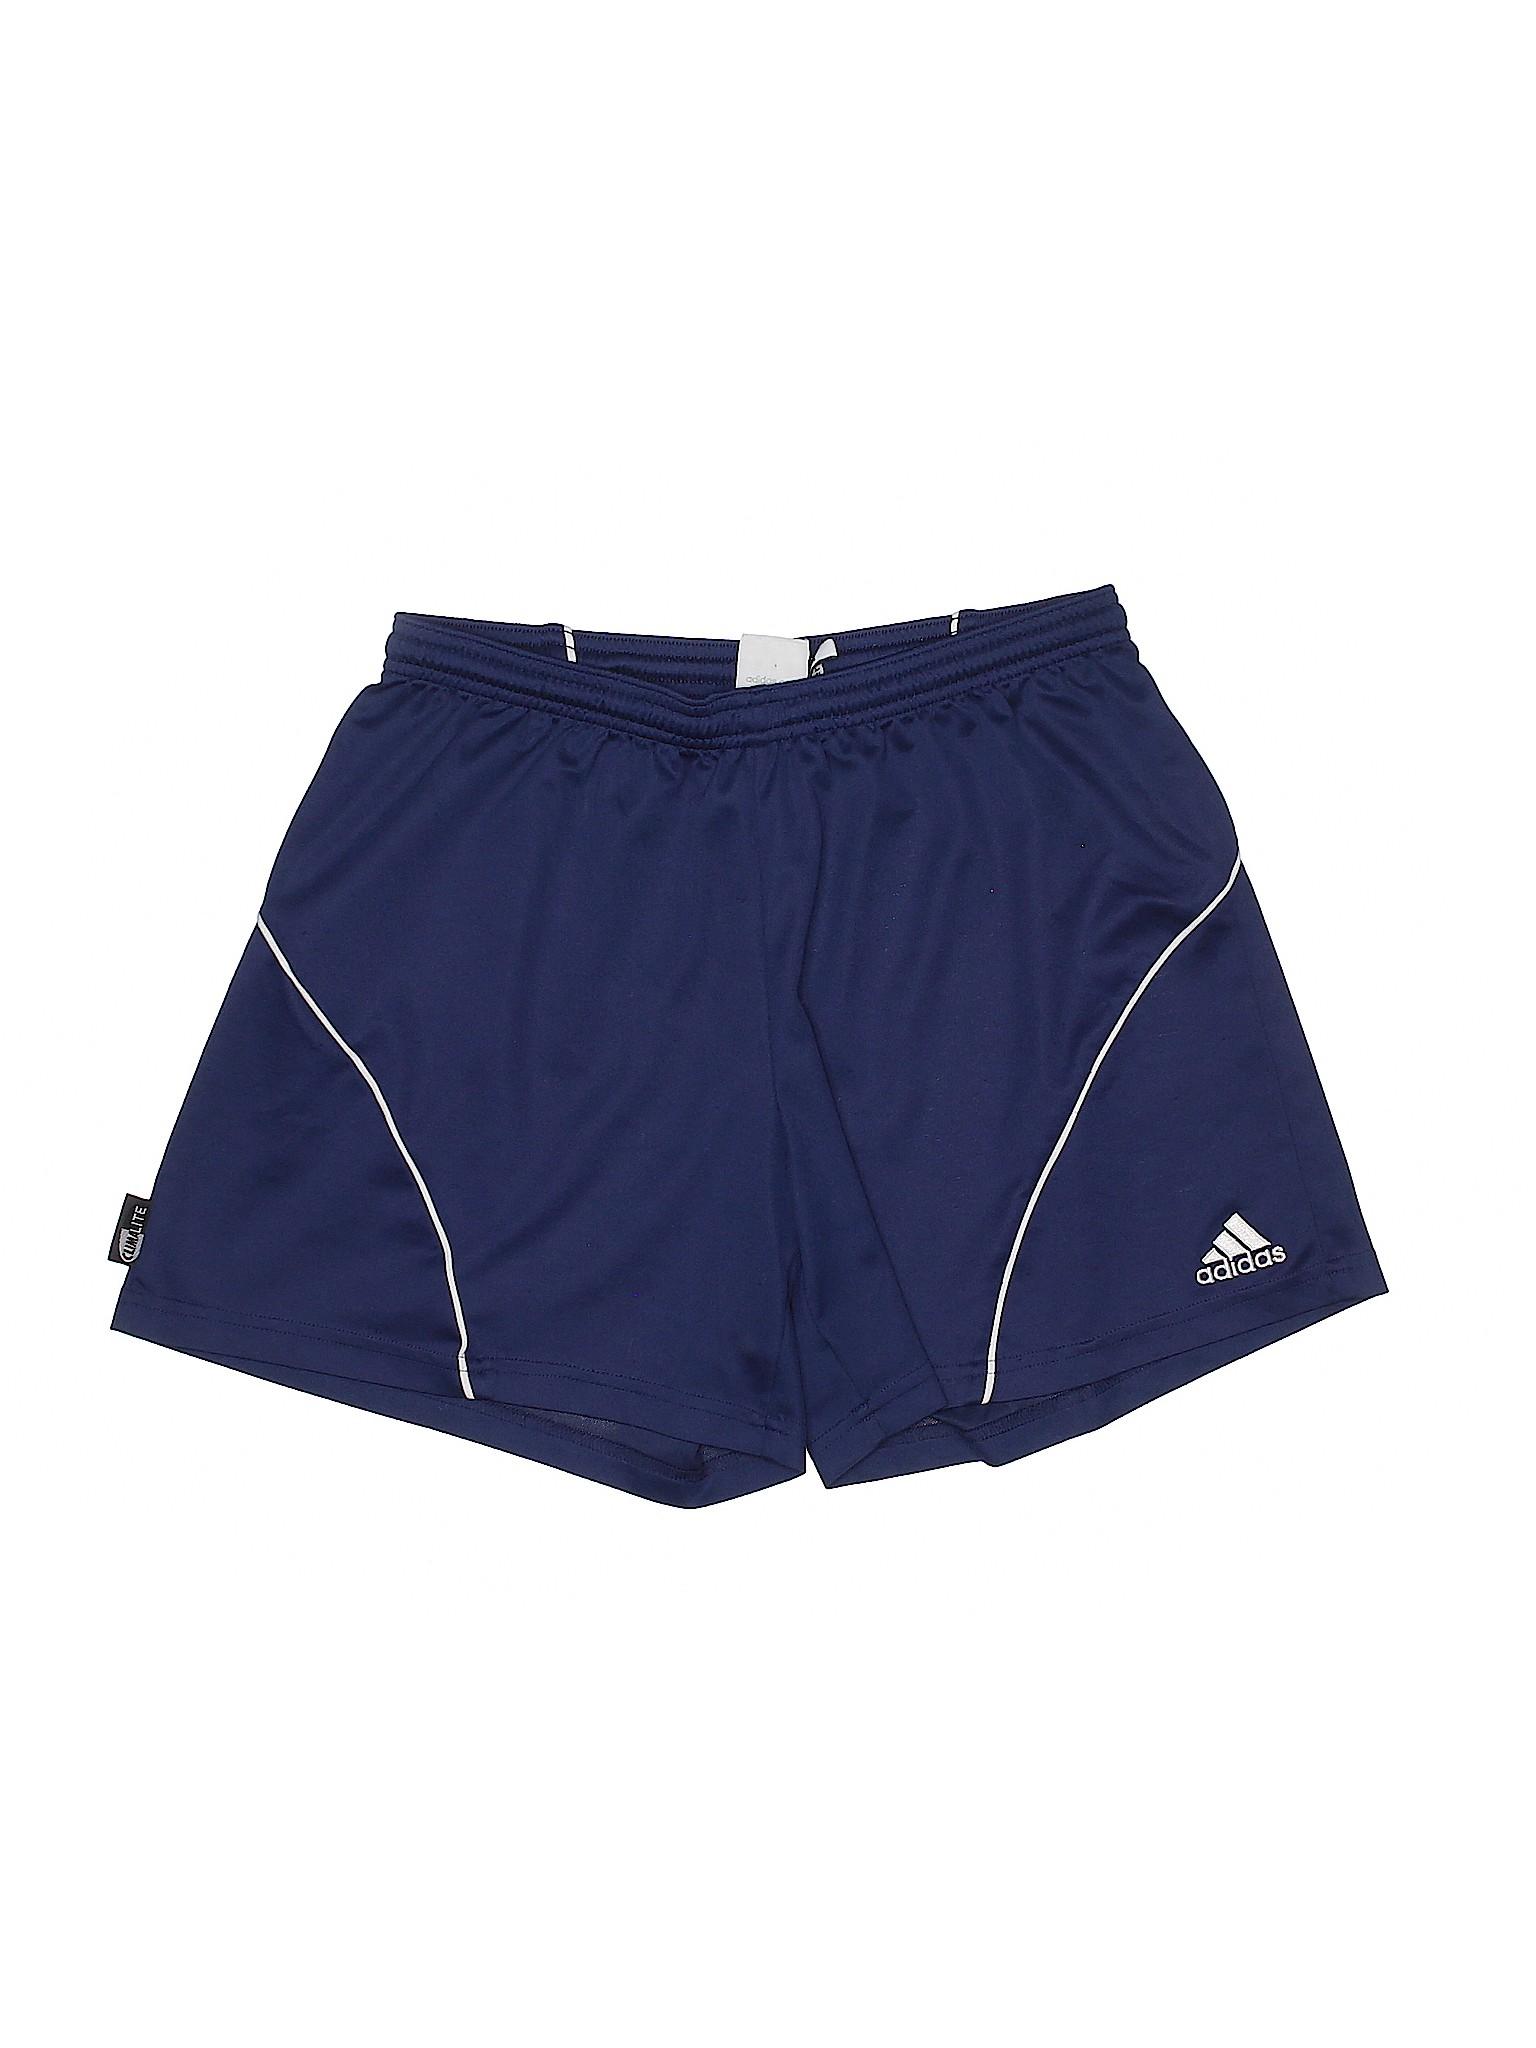 Boutique winter Shorts Athletic Boutique Adidas winter TnaTSx4rF